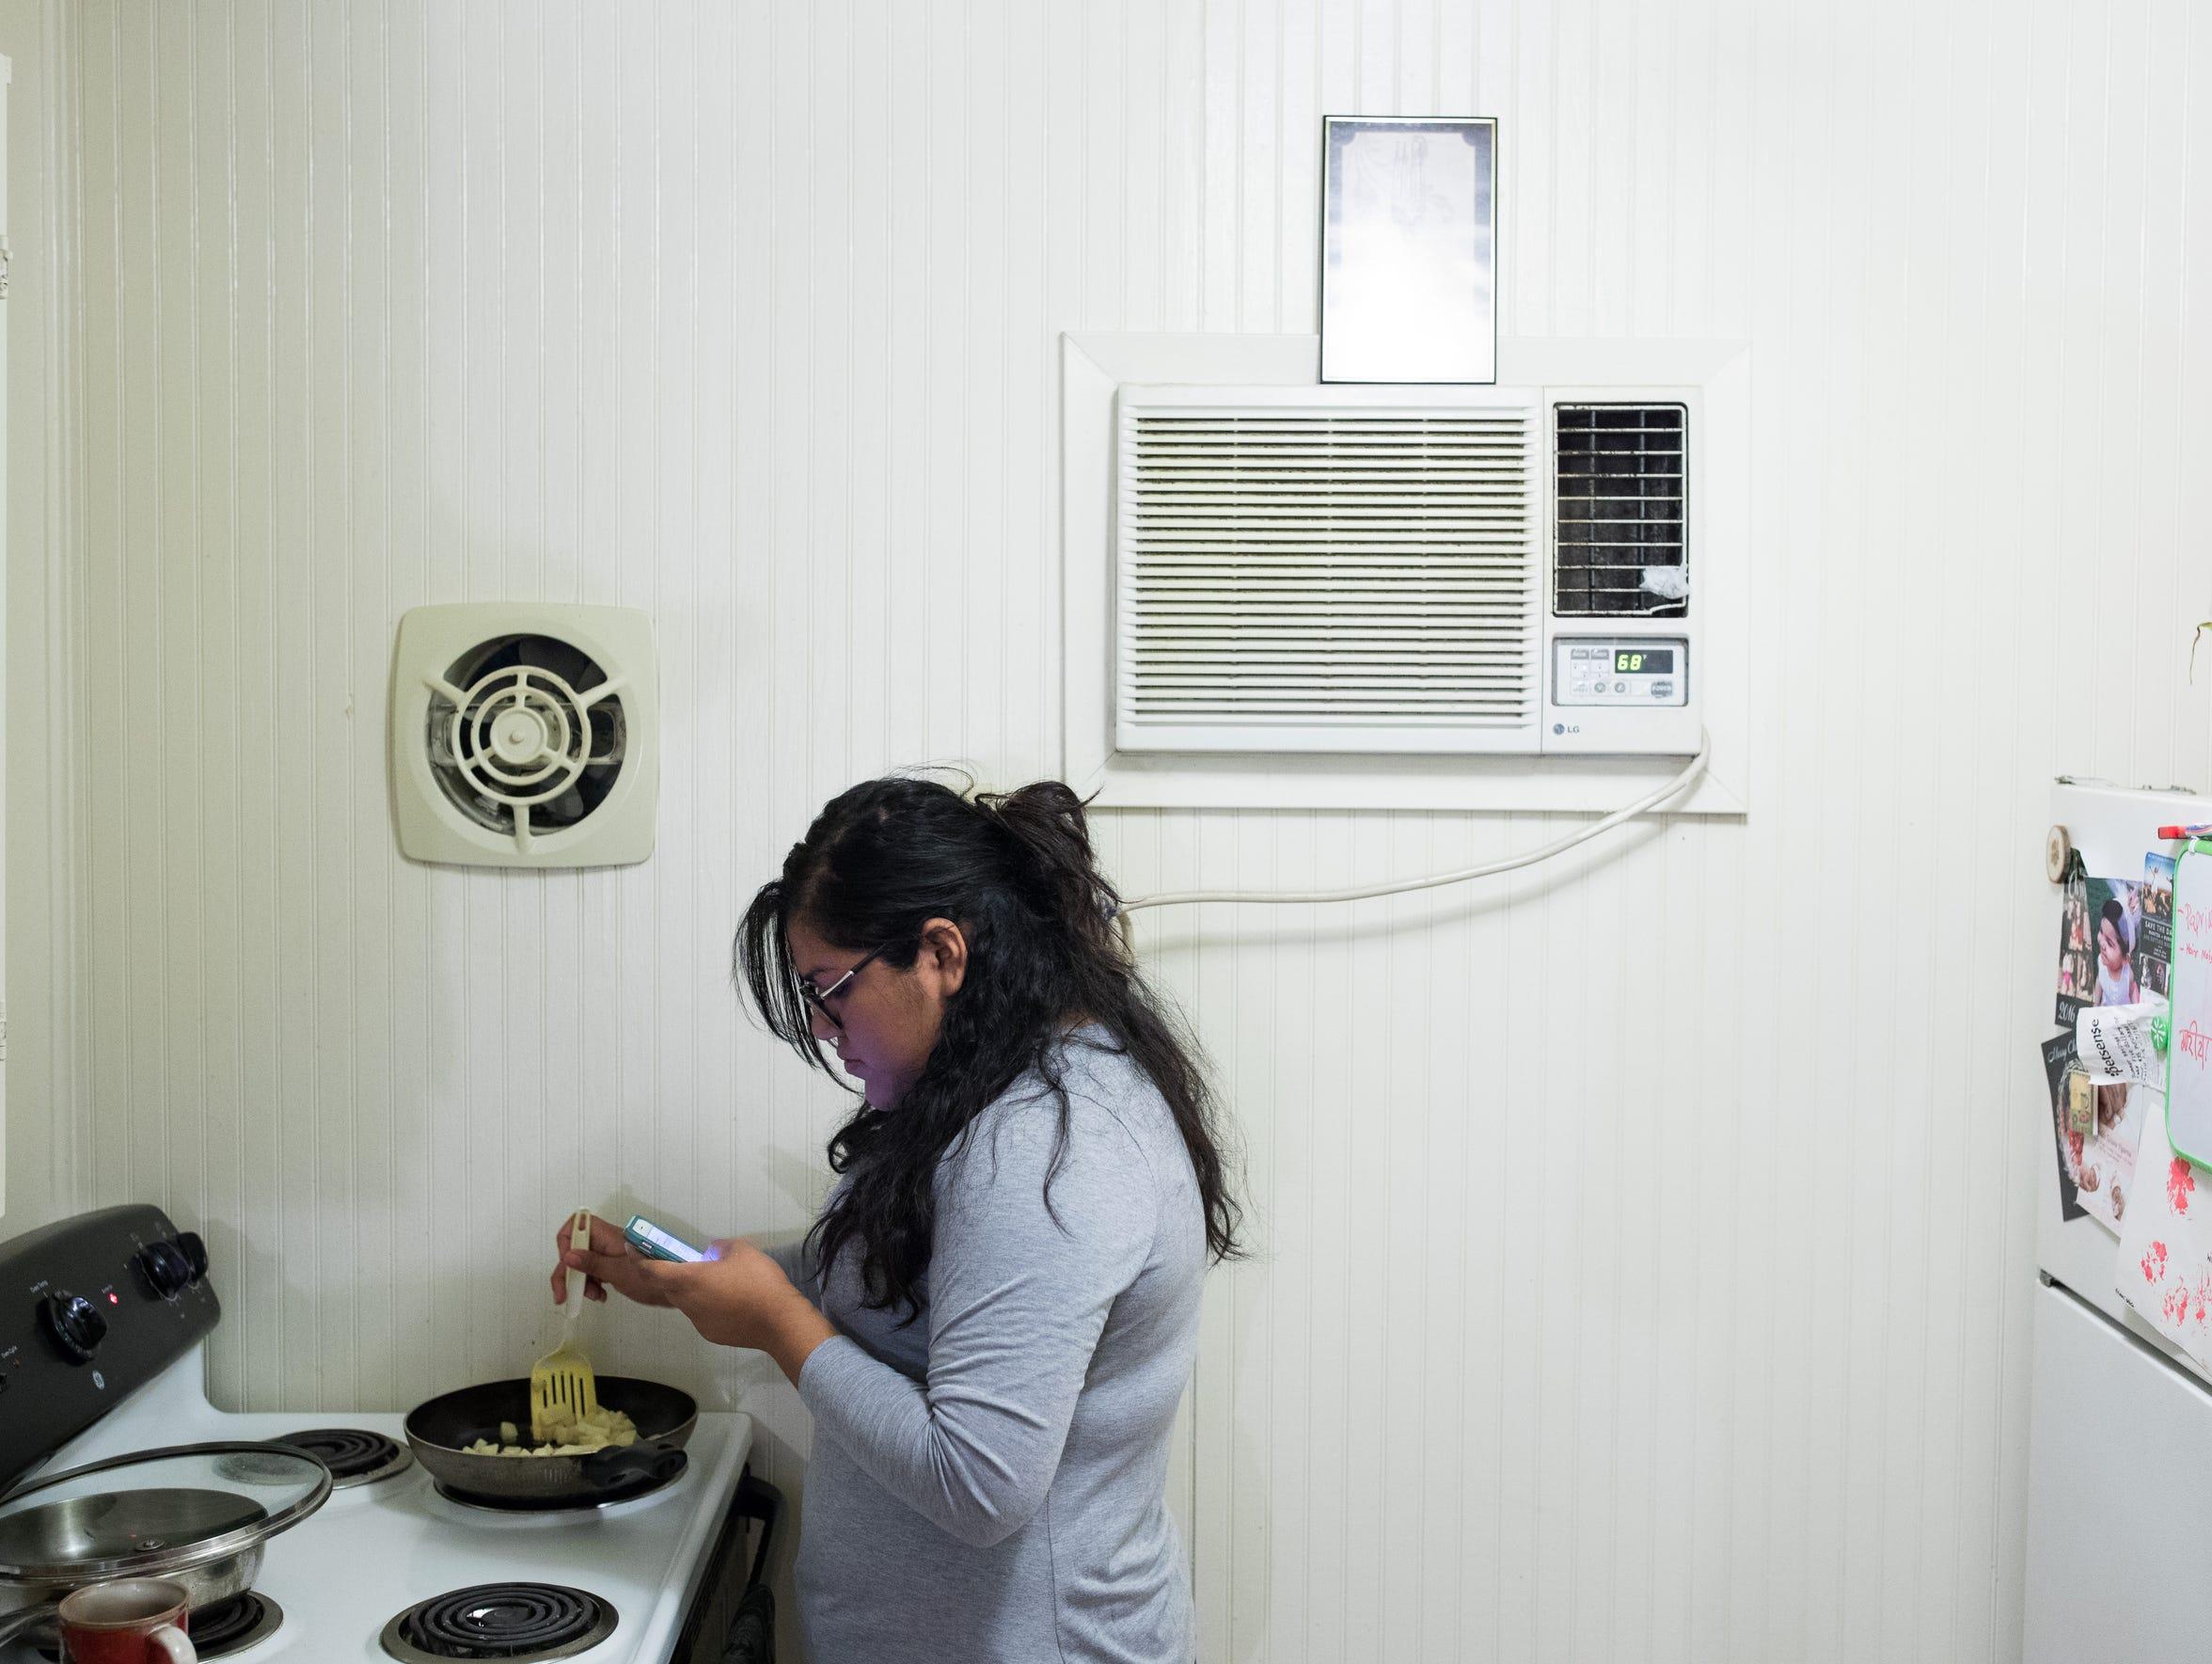 Maria Hernandez cooks breakfast in her apartment in